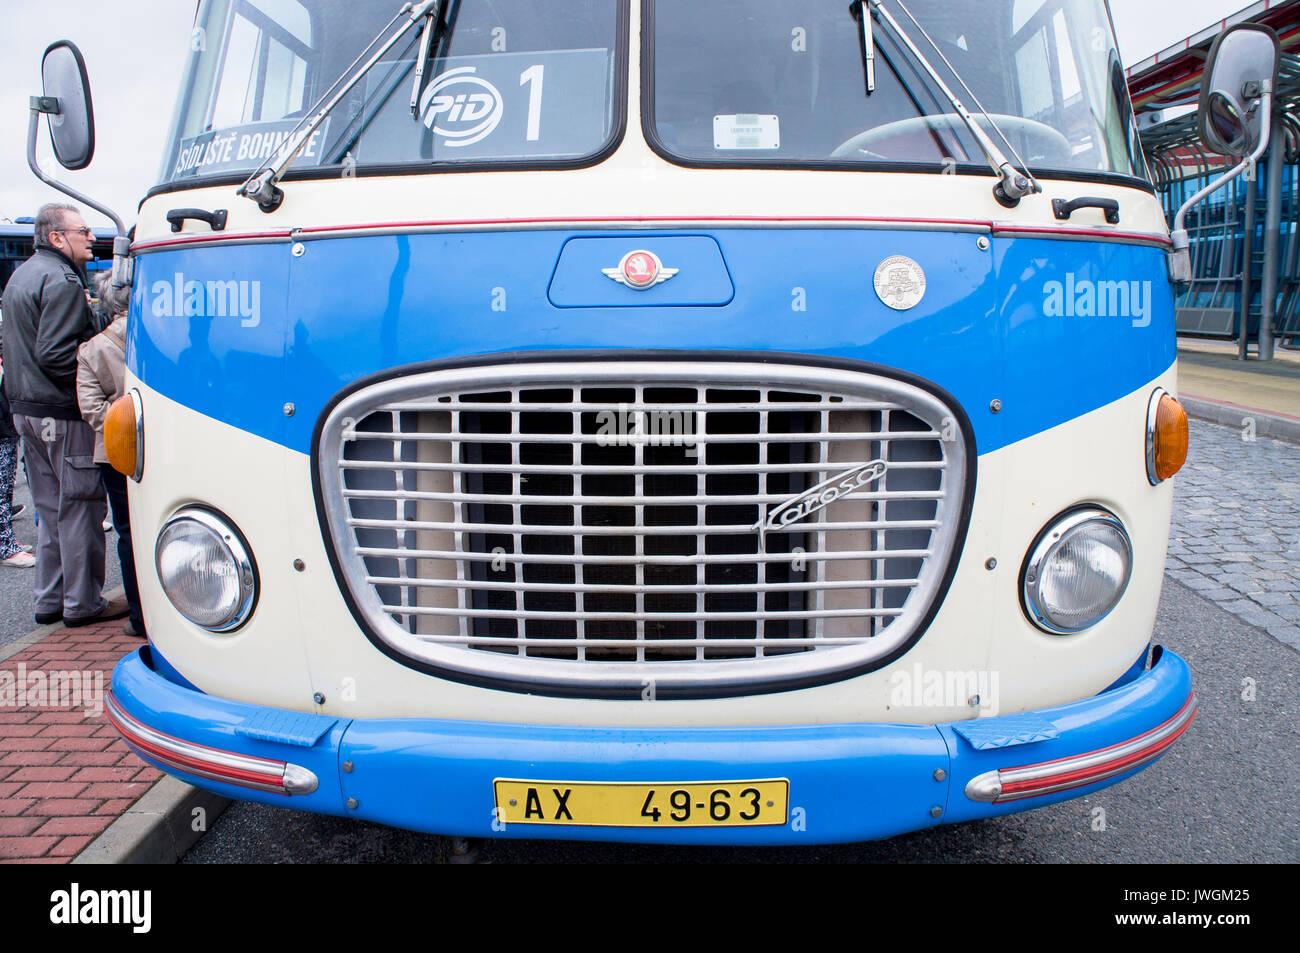 Skoda 706 RTO-KAR bus with trailer,25th anniversary of ROPID - Stock Image